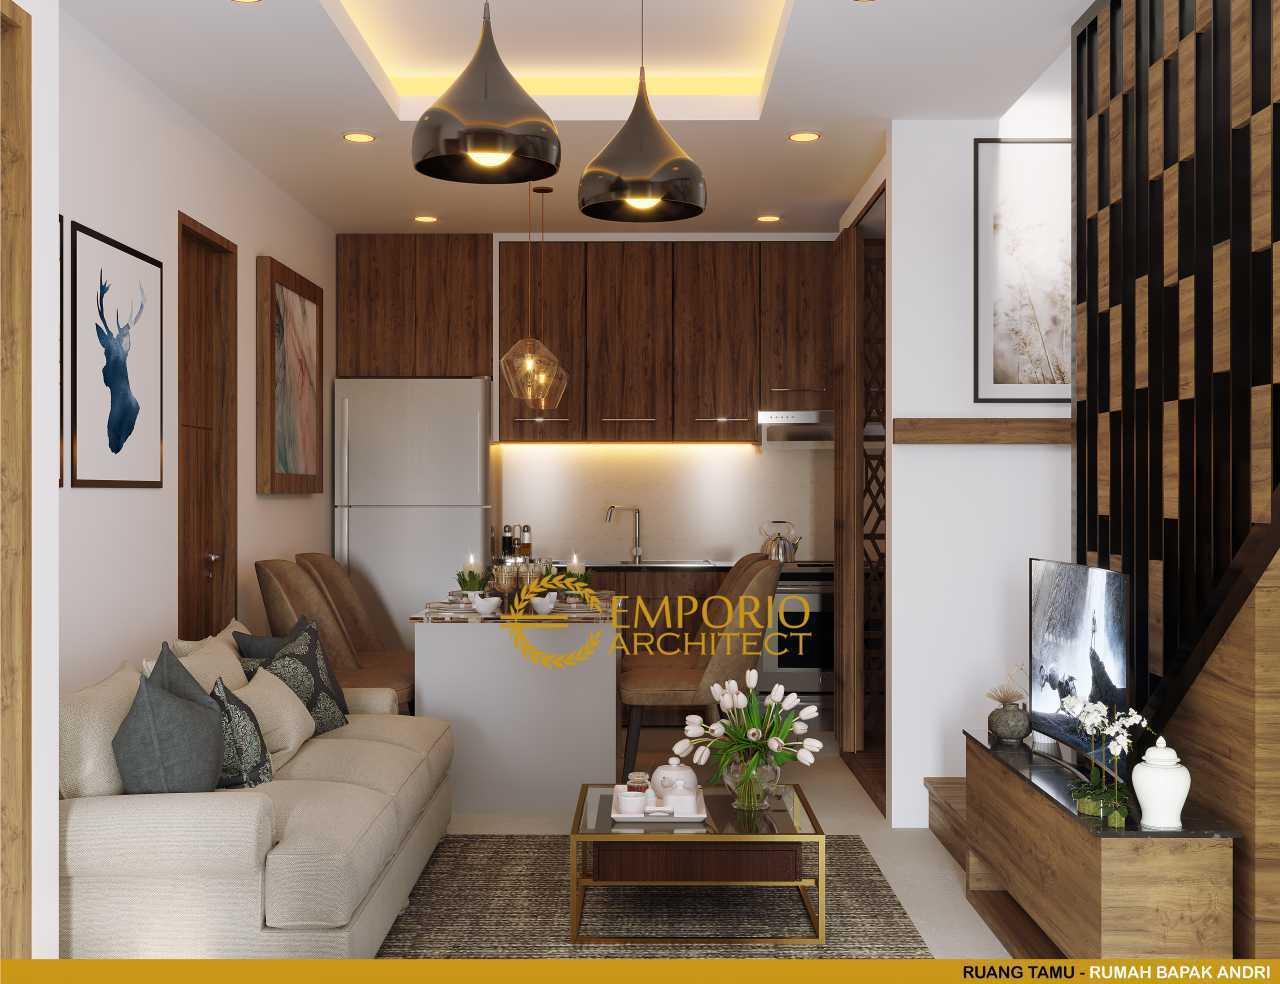 Emporio Architect Jasa Arsitek Jakarta Desain Rumah Modern 2 Lantai 759 @ Jakarta Timur Jakarta Timur, Kota Jakarta Timur, Daerah Khusus Ibukota Jakarta, Indonesia Jakarta Timur, Kota Jakarta Timur, Daerah Khusus Ibukota Jakarta, Indonesia Emporio-Architect-Jasa-Arsitek-Jakarta-Desain-Rumah-Modern-2-Lantai-759-Jakarta-Timur  87093